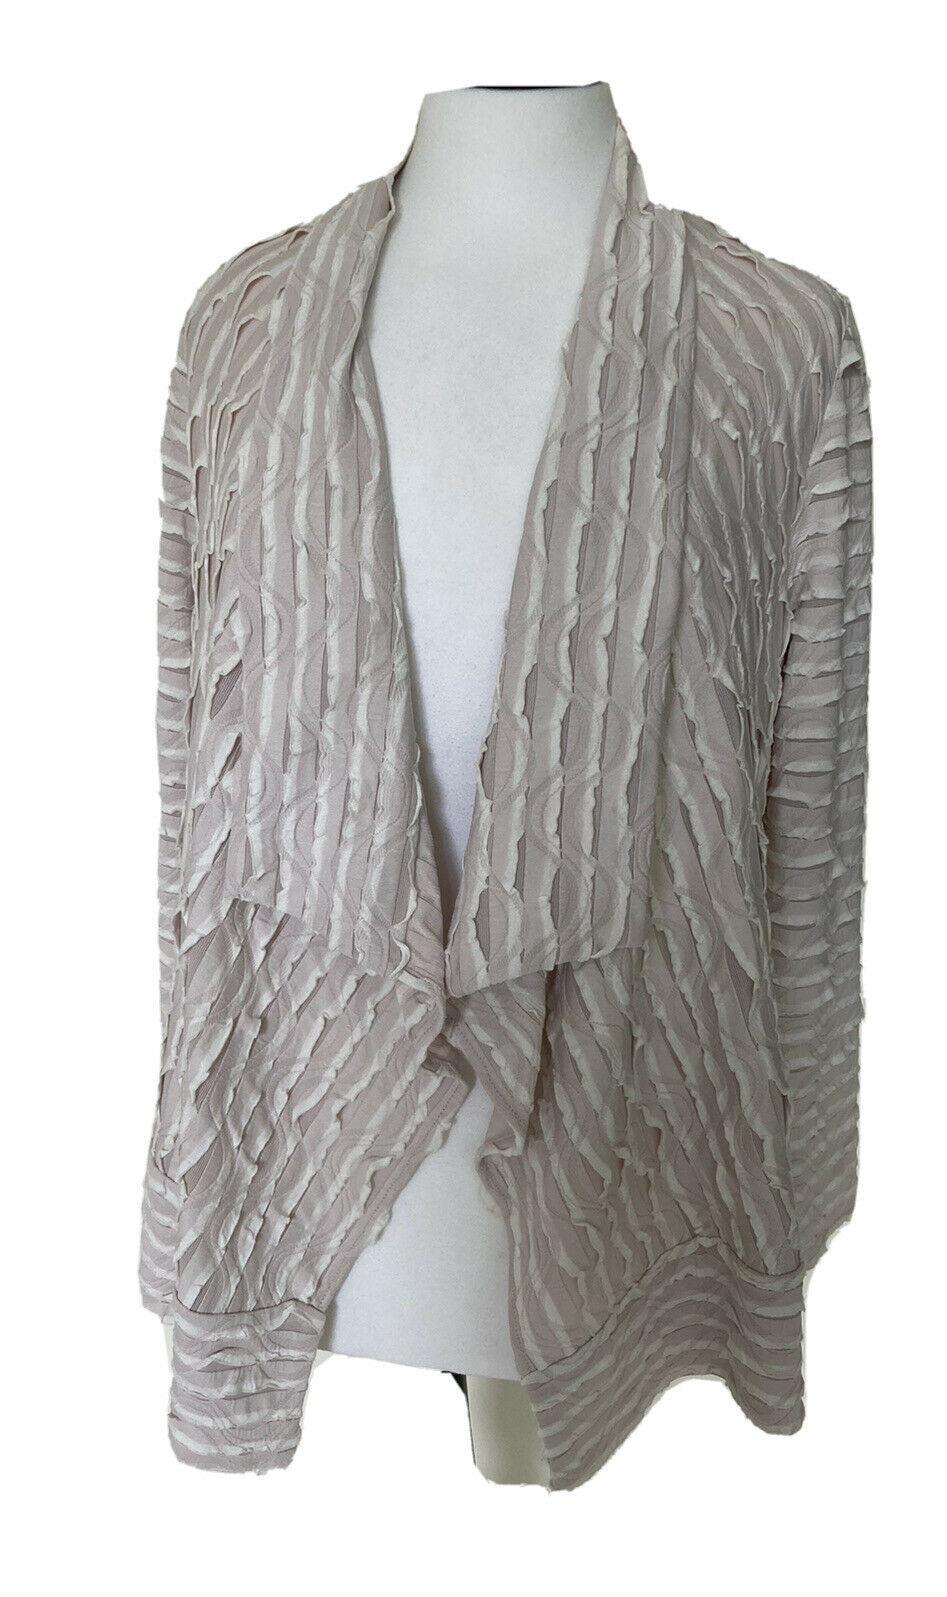 CHESCA : Cream & Stone Ruffle Striped Waterfall Jacket Size 2 = 14 / 16